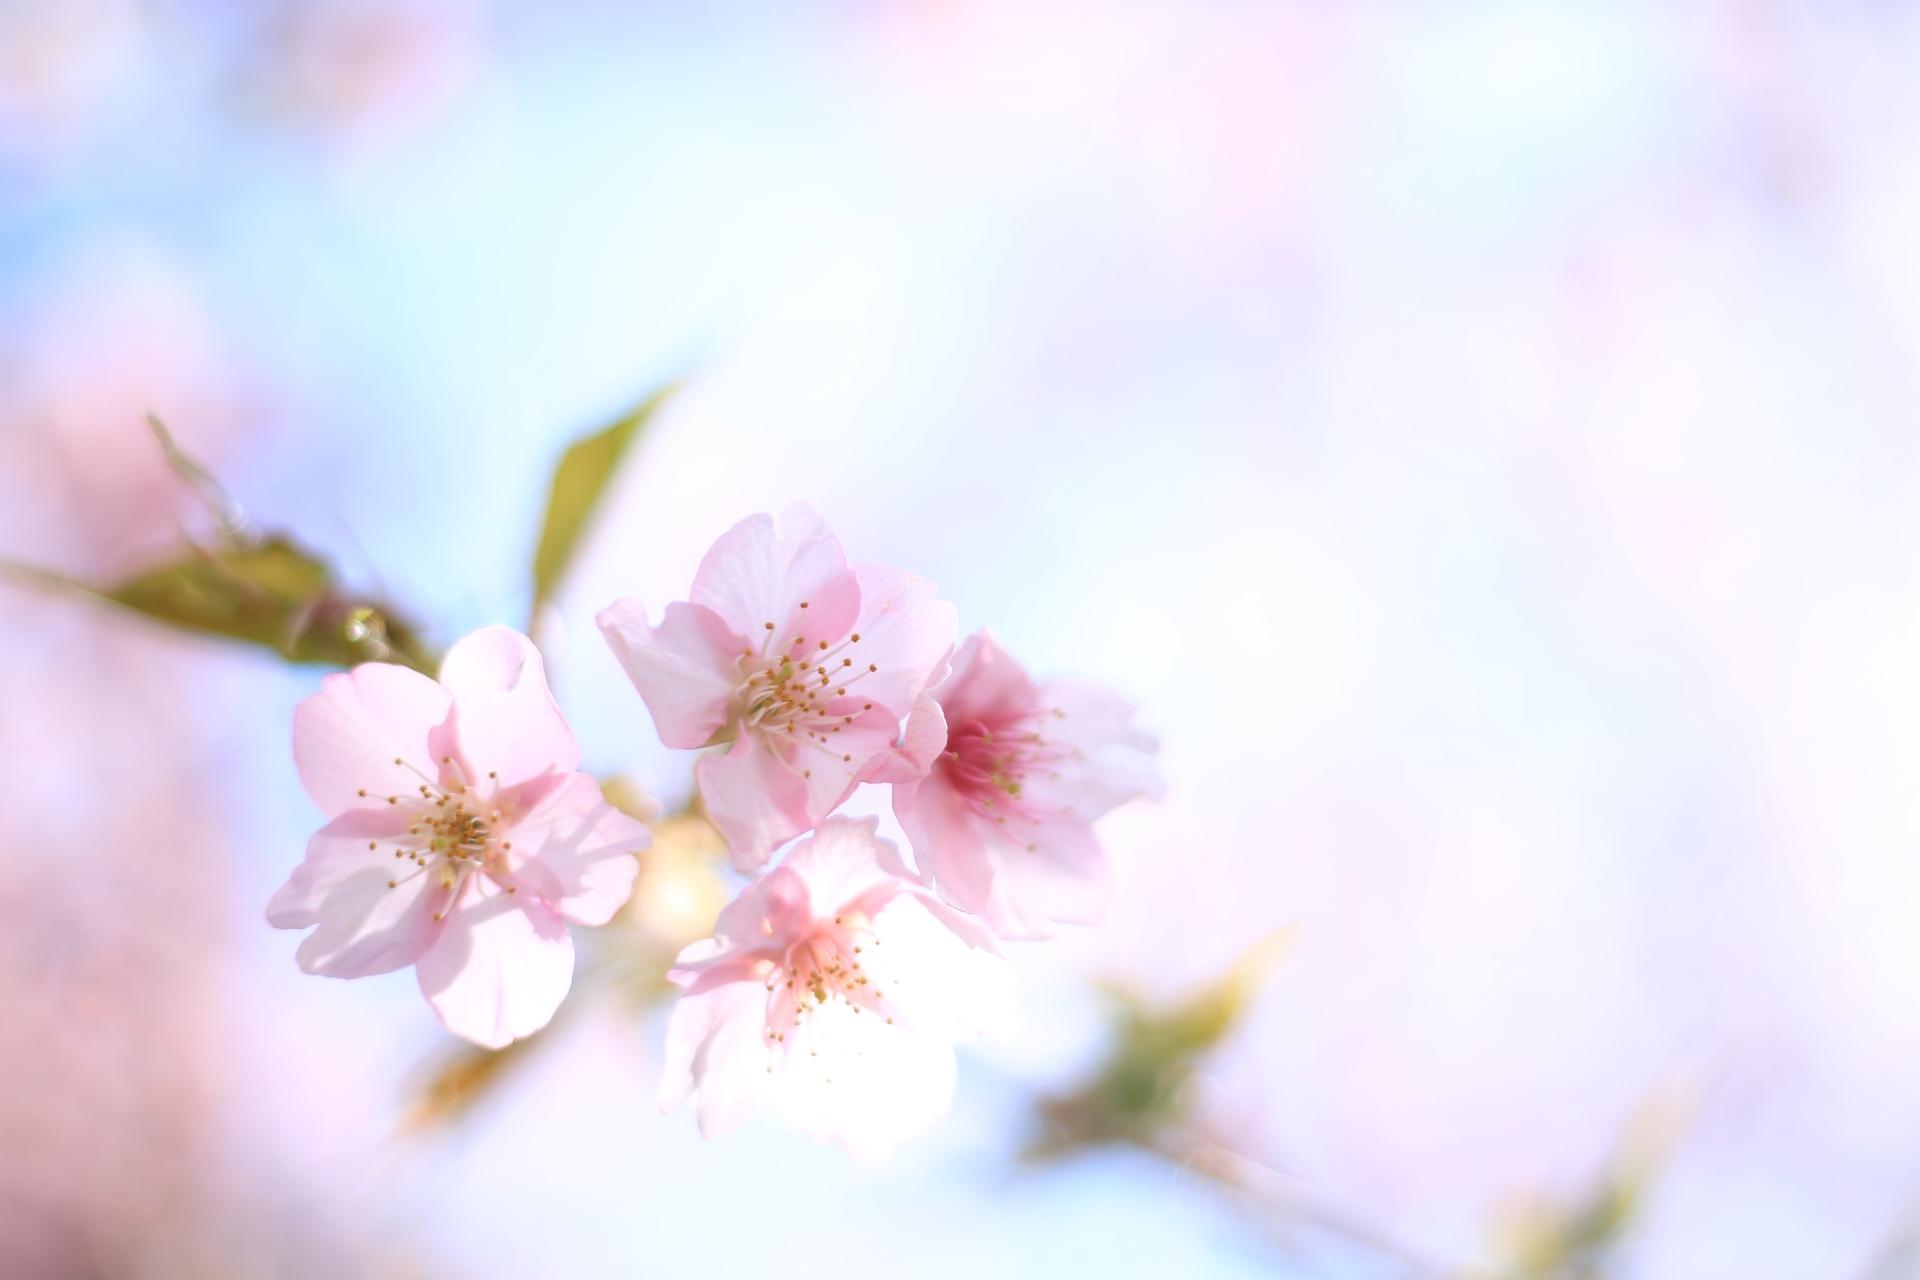 Cenbless 成増フェイシャル&ネイルサロン 2020年卒園式・卒業式・入園式・入学式